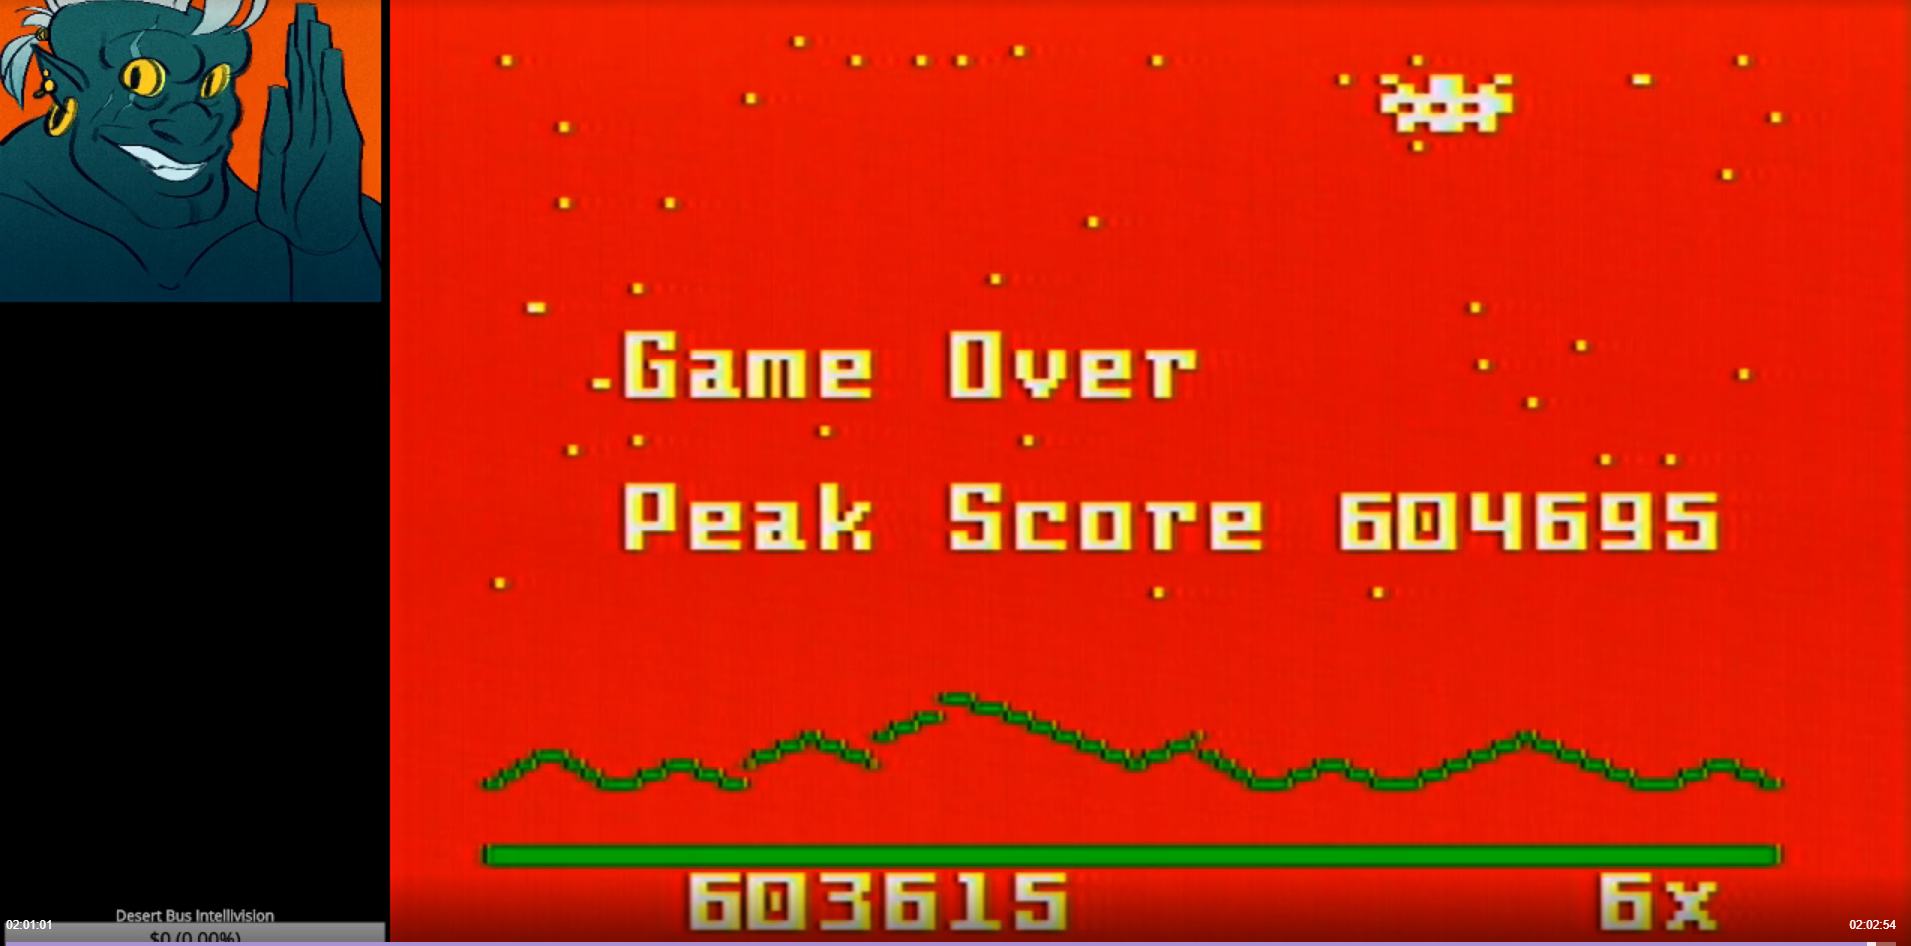 Astrosmash [Final Score] 603,615 points